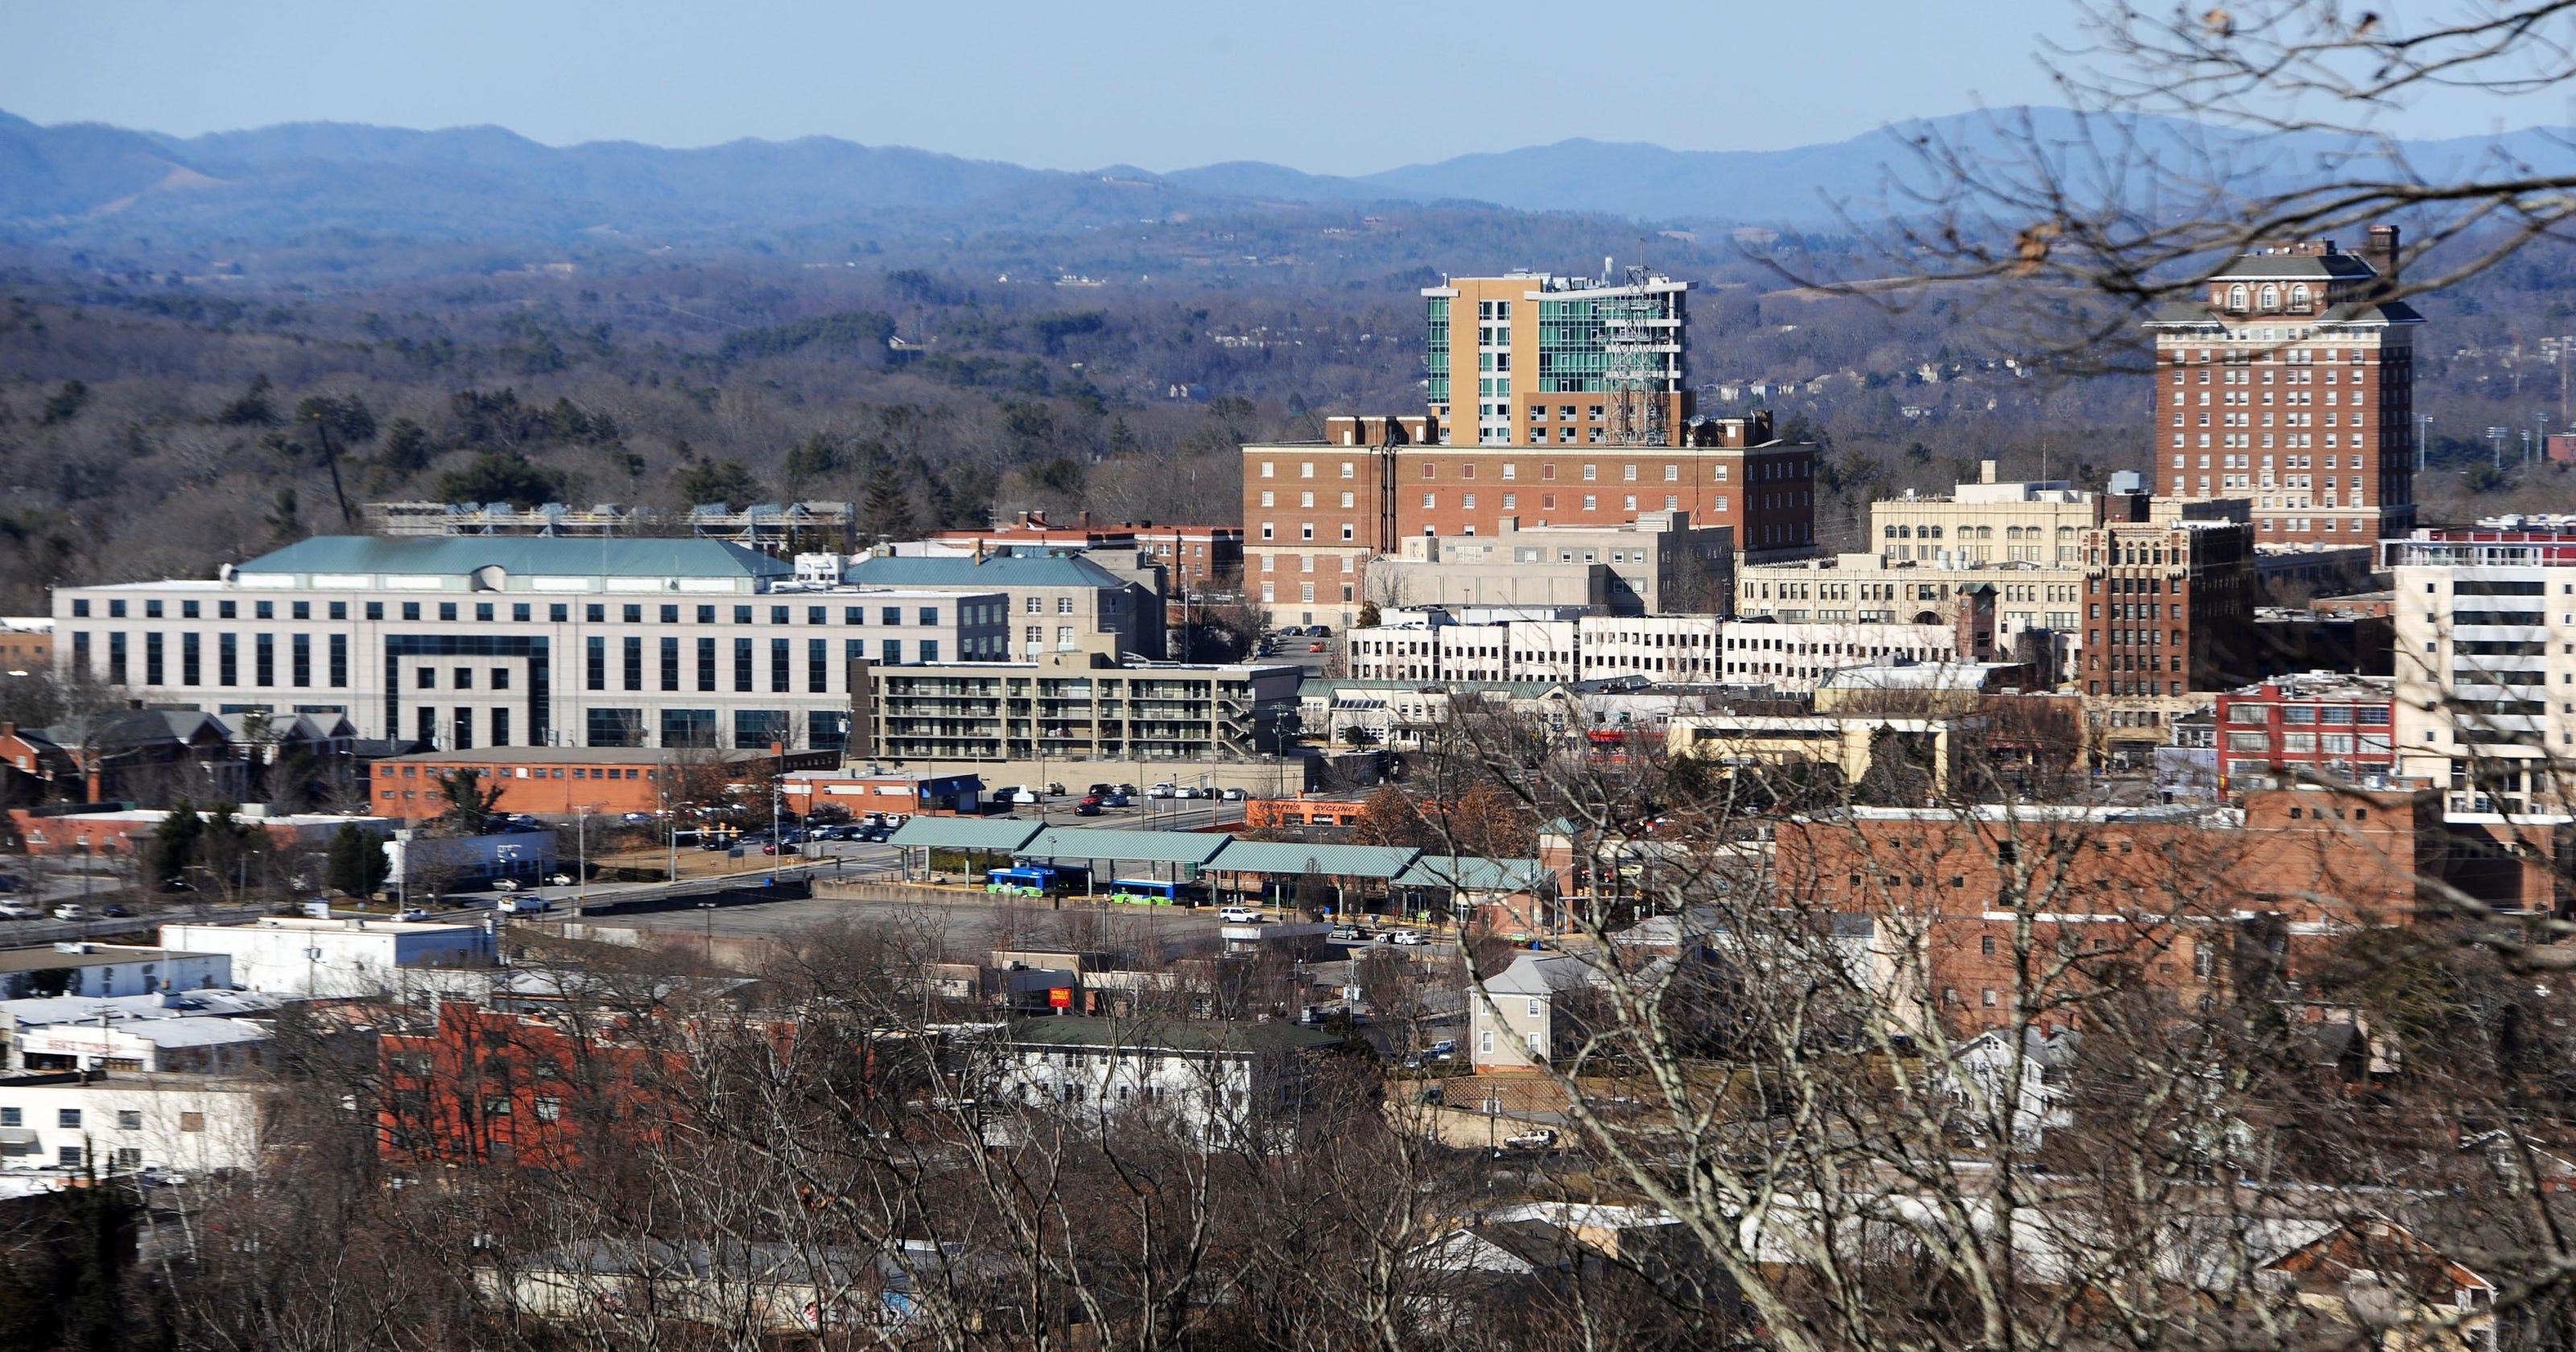 Asheville gets SolSmart designation as it prioritizes